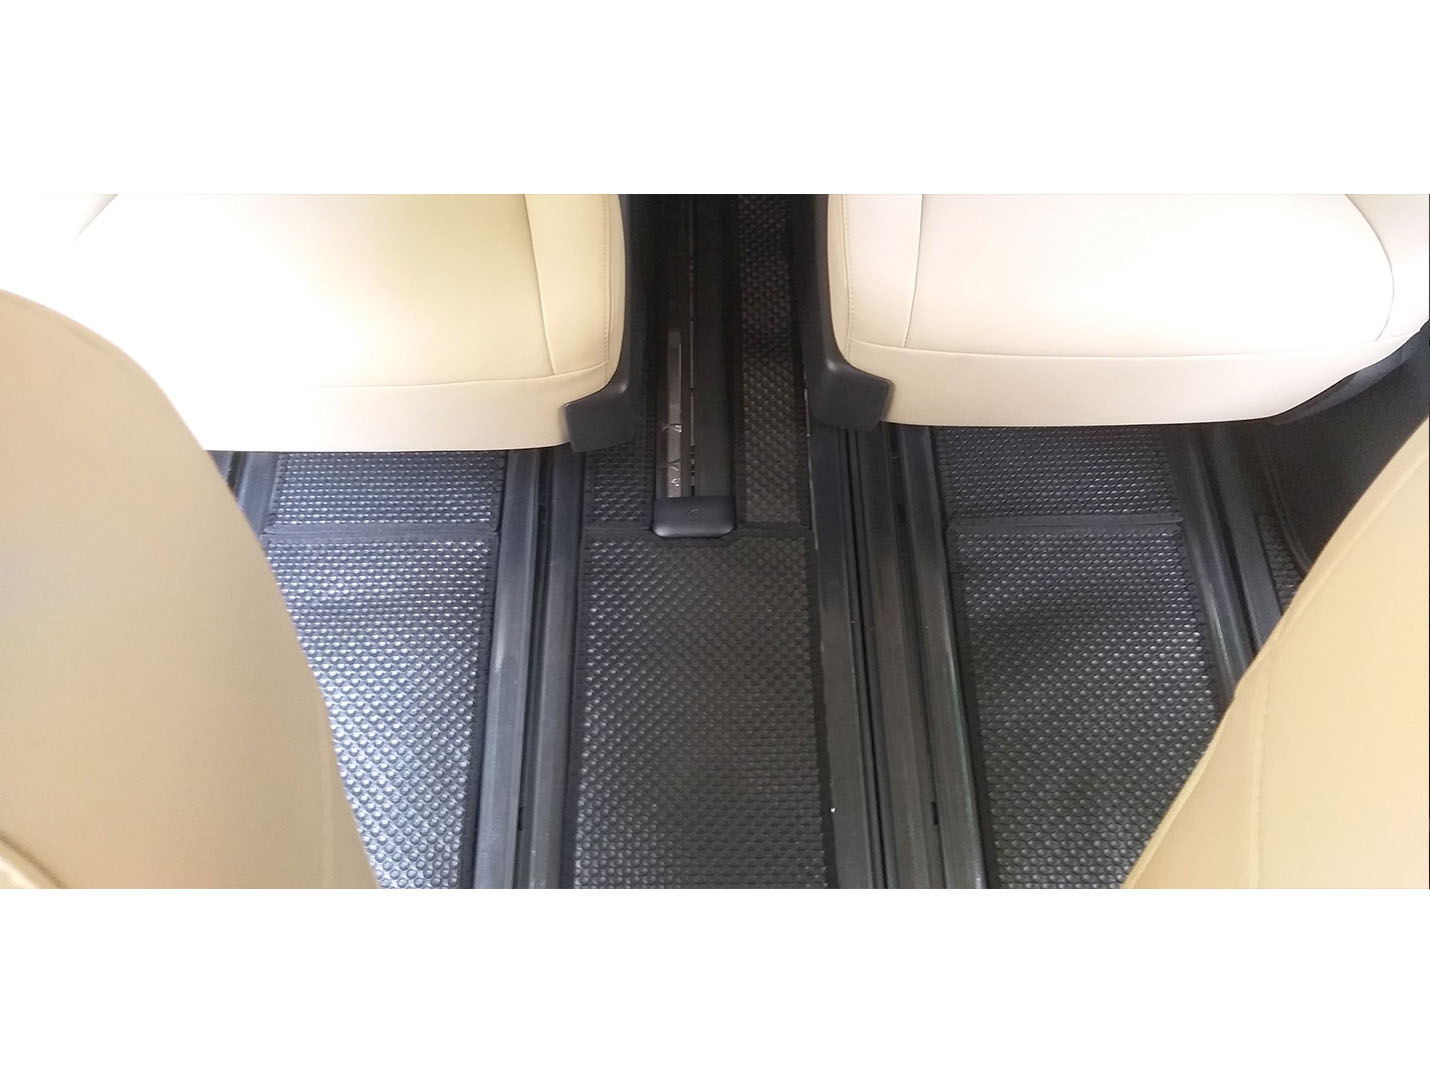 Thảm lót sàn Toyota Granvia 2020